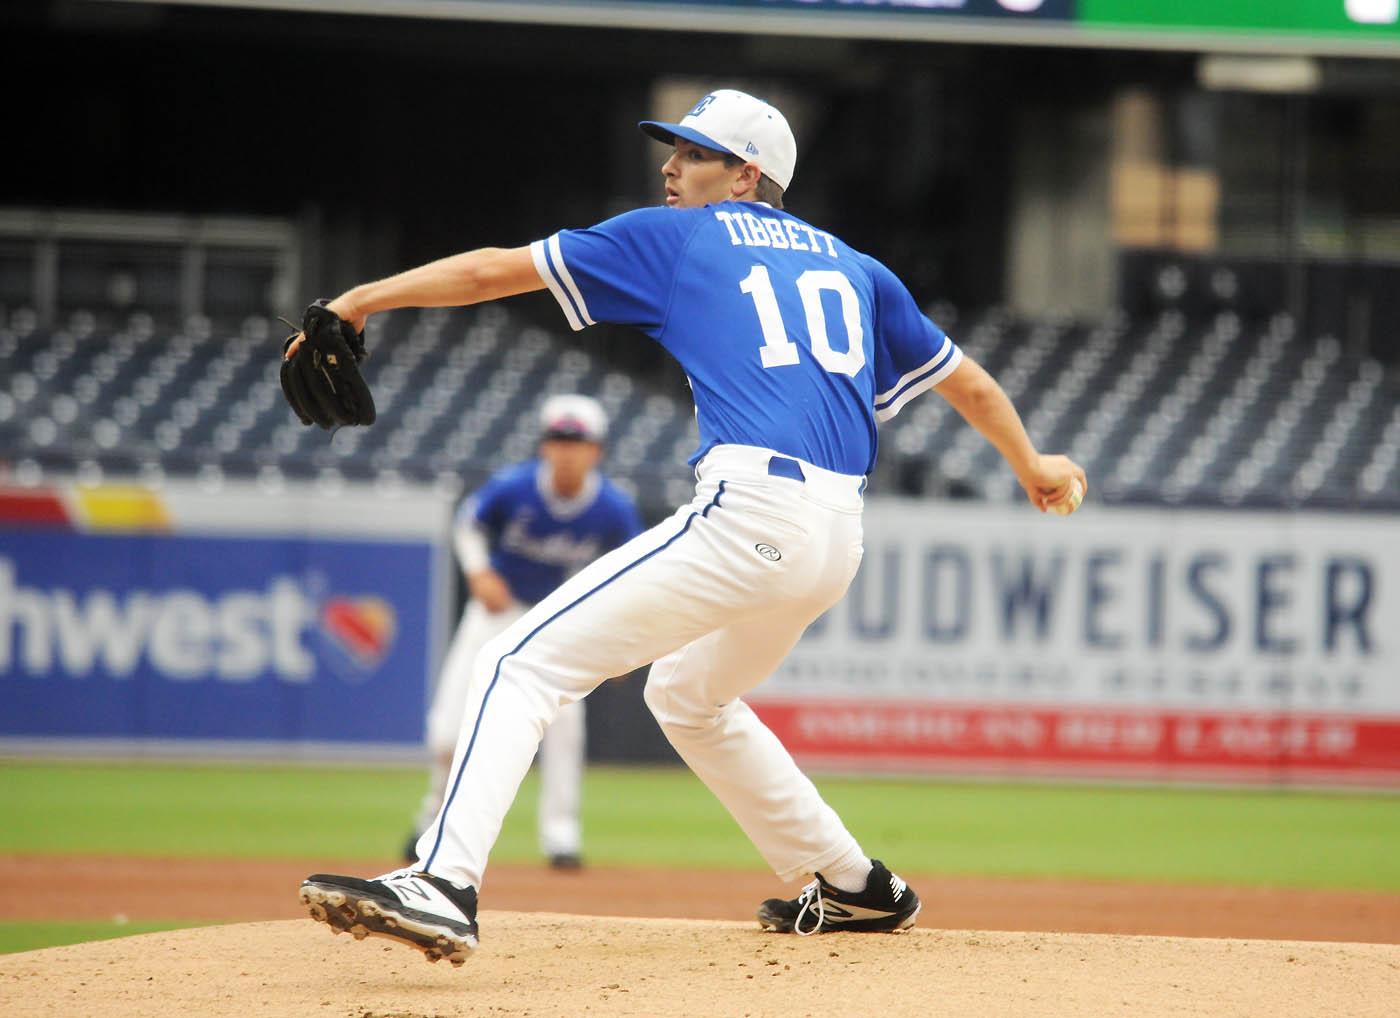 Collegiate Baseball League Soars To Finish